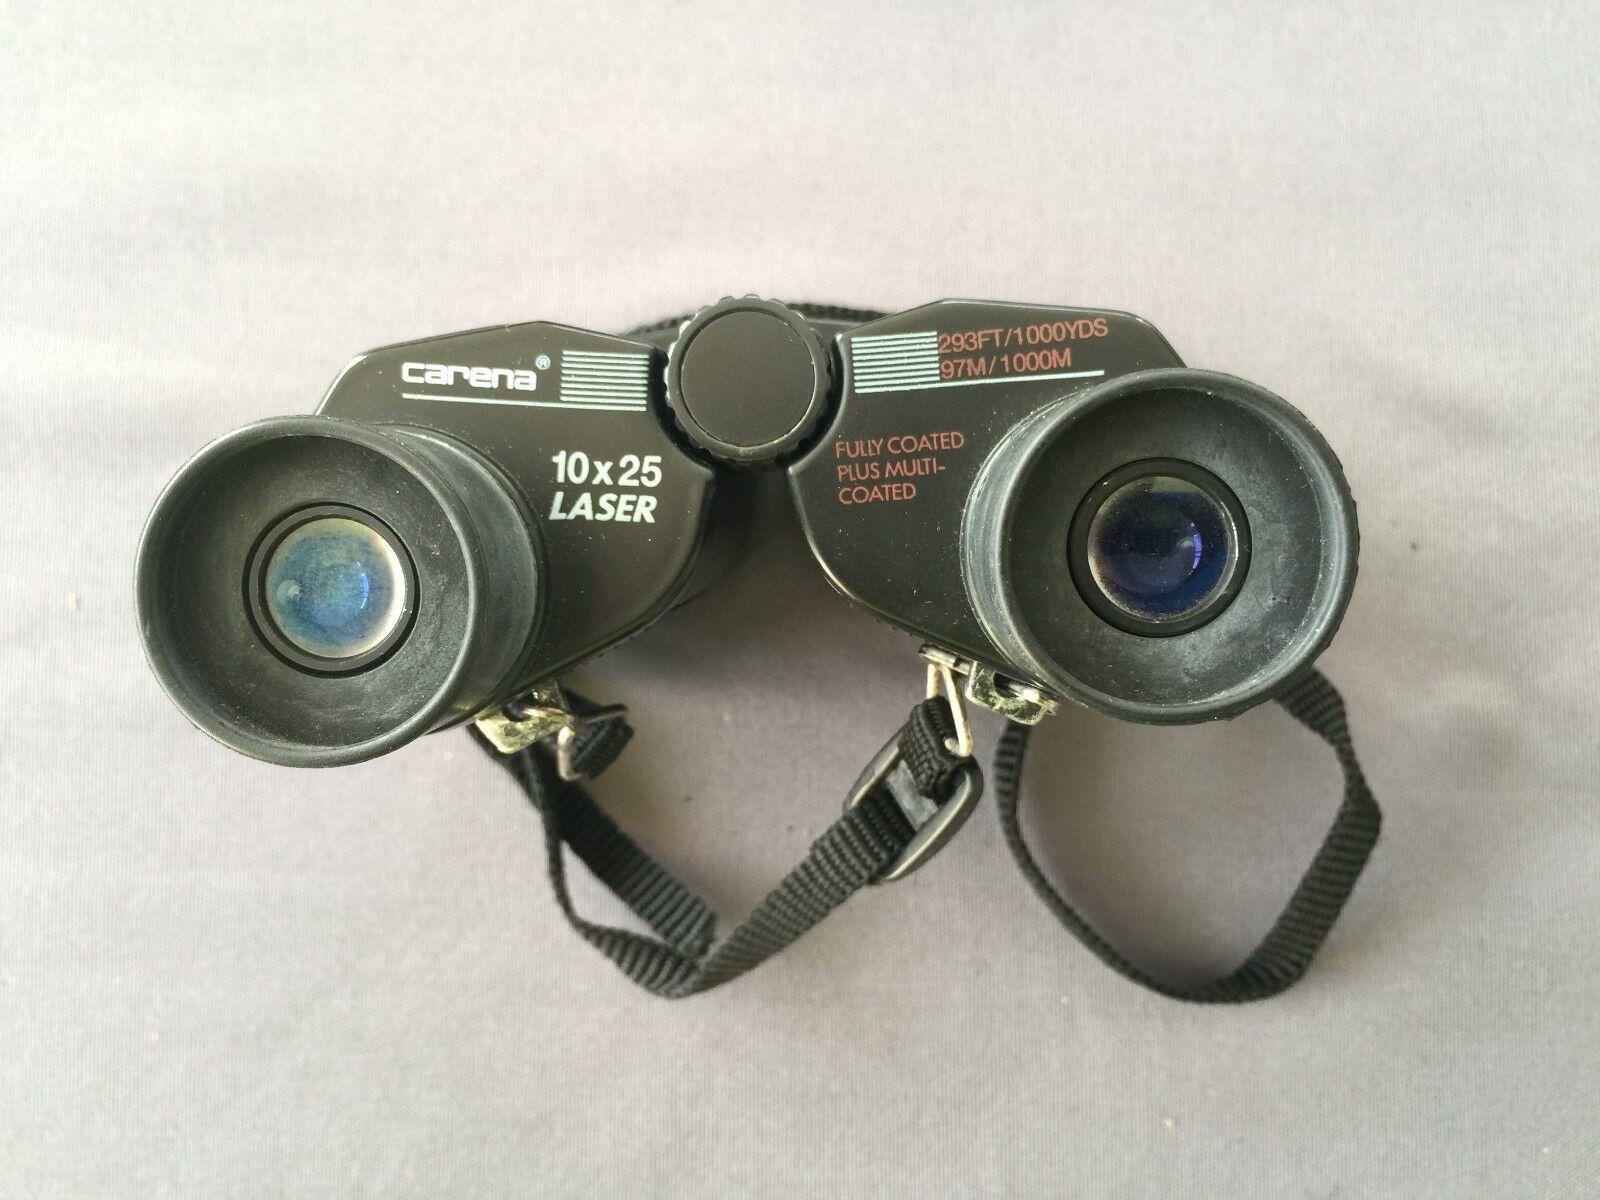 Prismáticos binocular CARENA 10X25 LASER con estuche 293FT 1000YDS 97M 1000M